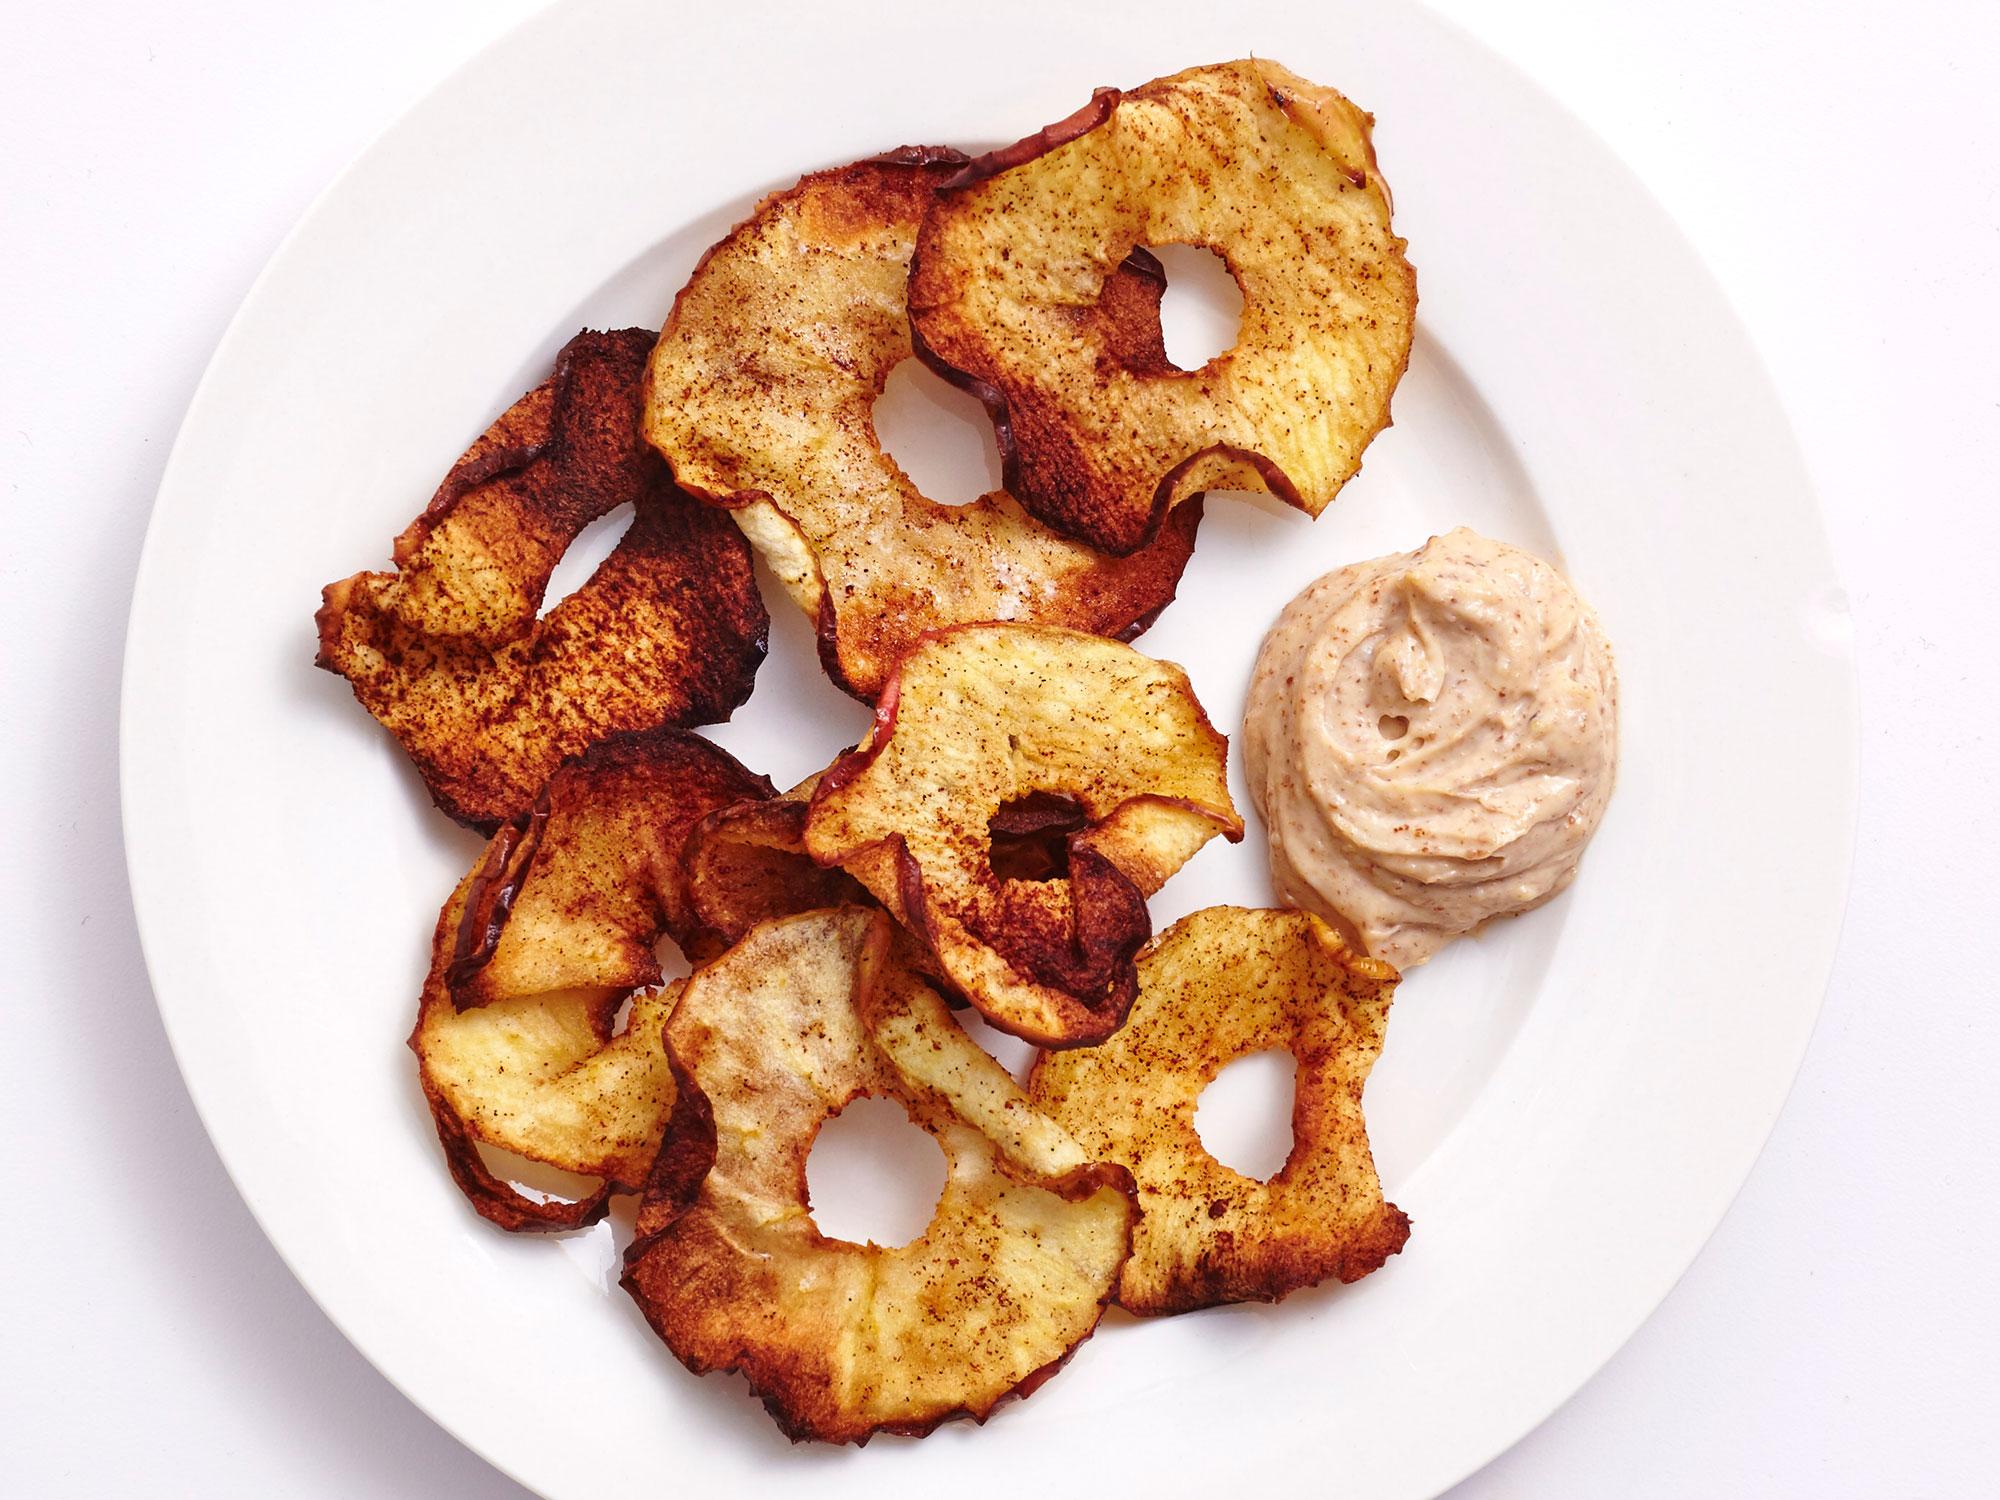 ck-Make These Easy Air-Fried Cinnamon Apple Chips With Almond Yogurt Dip